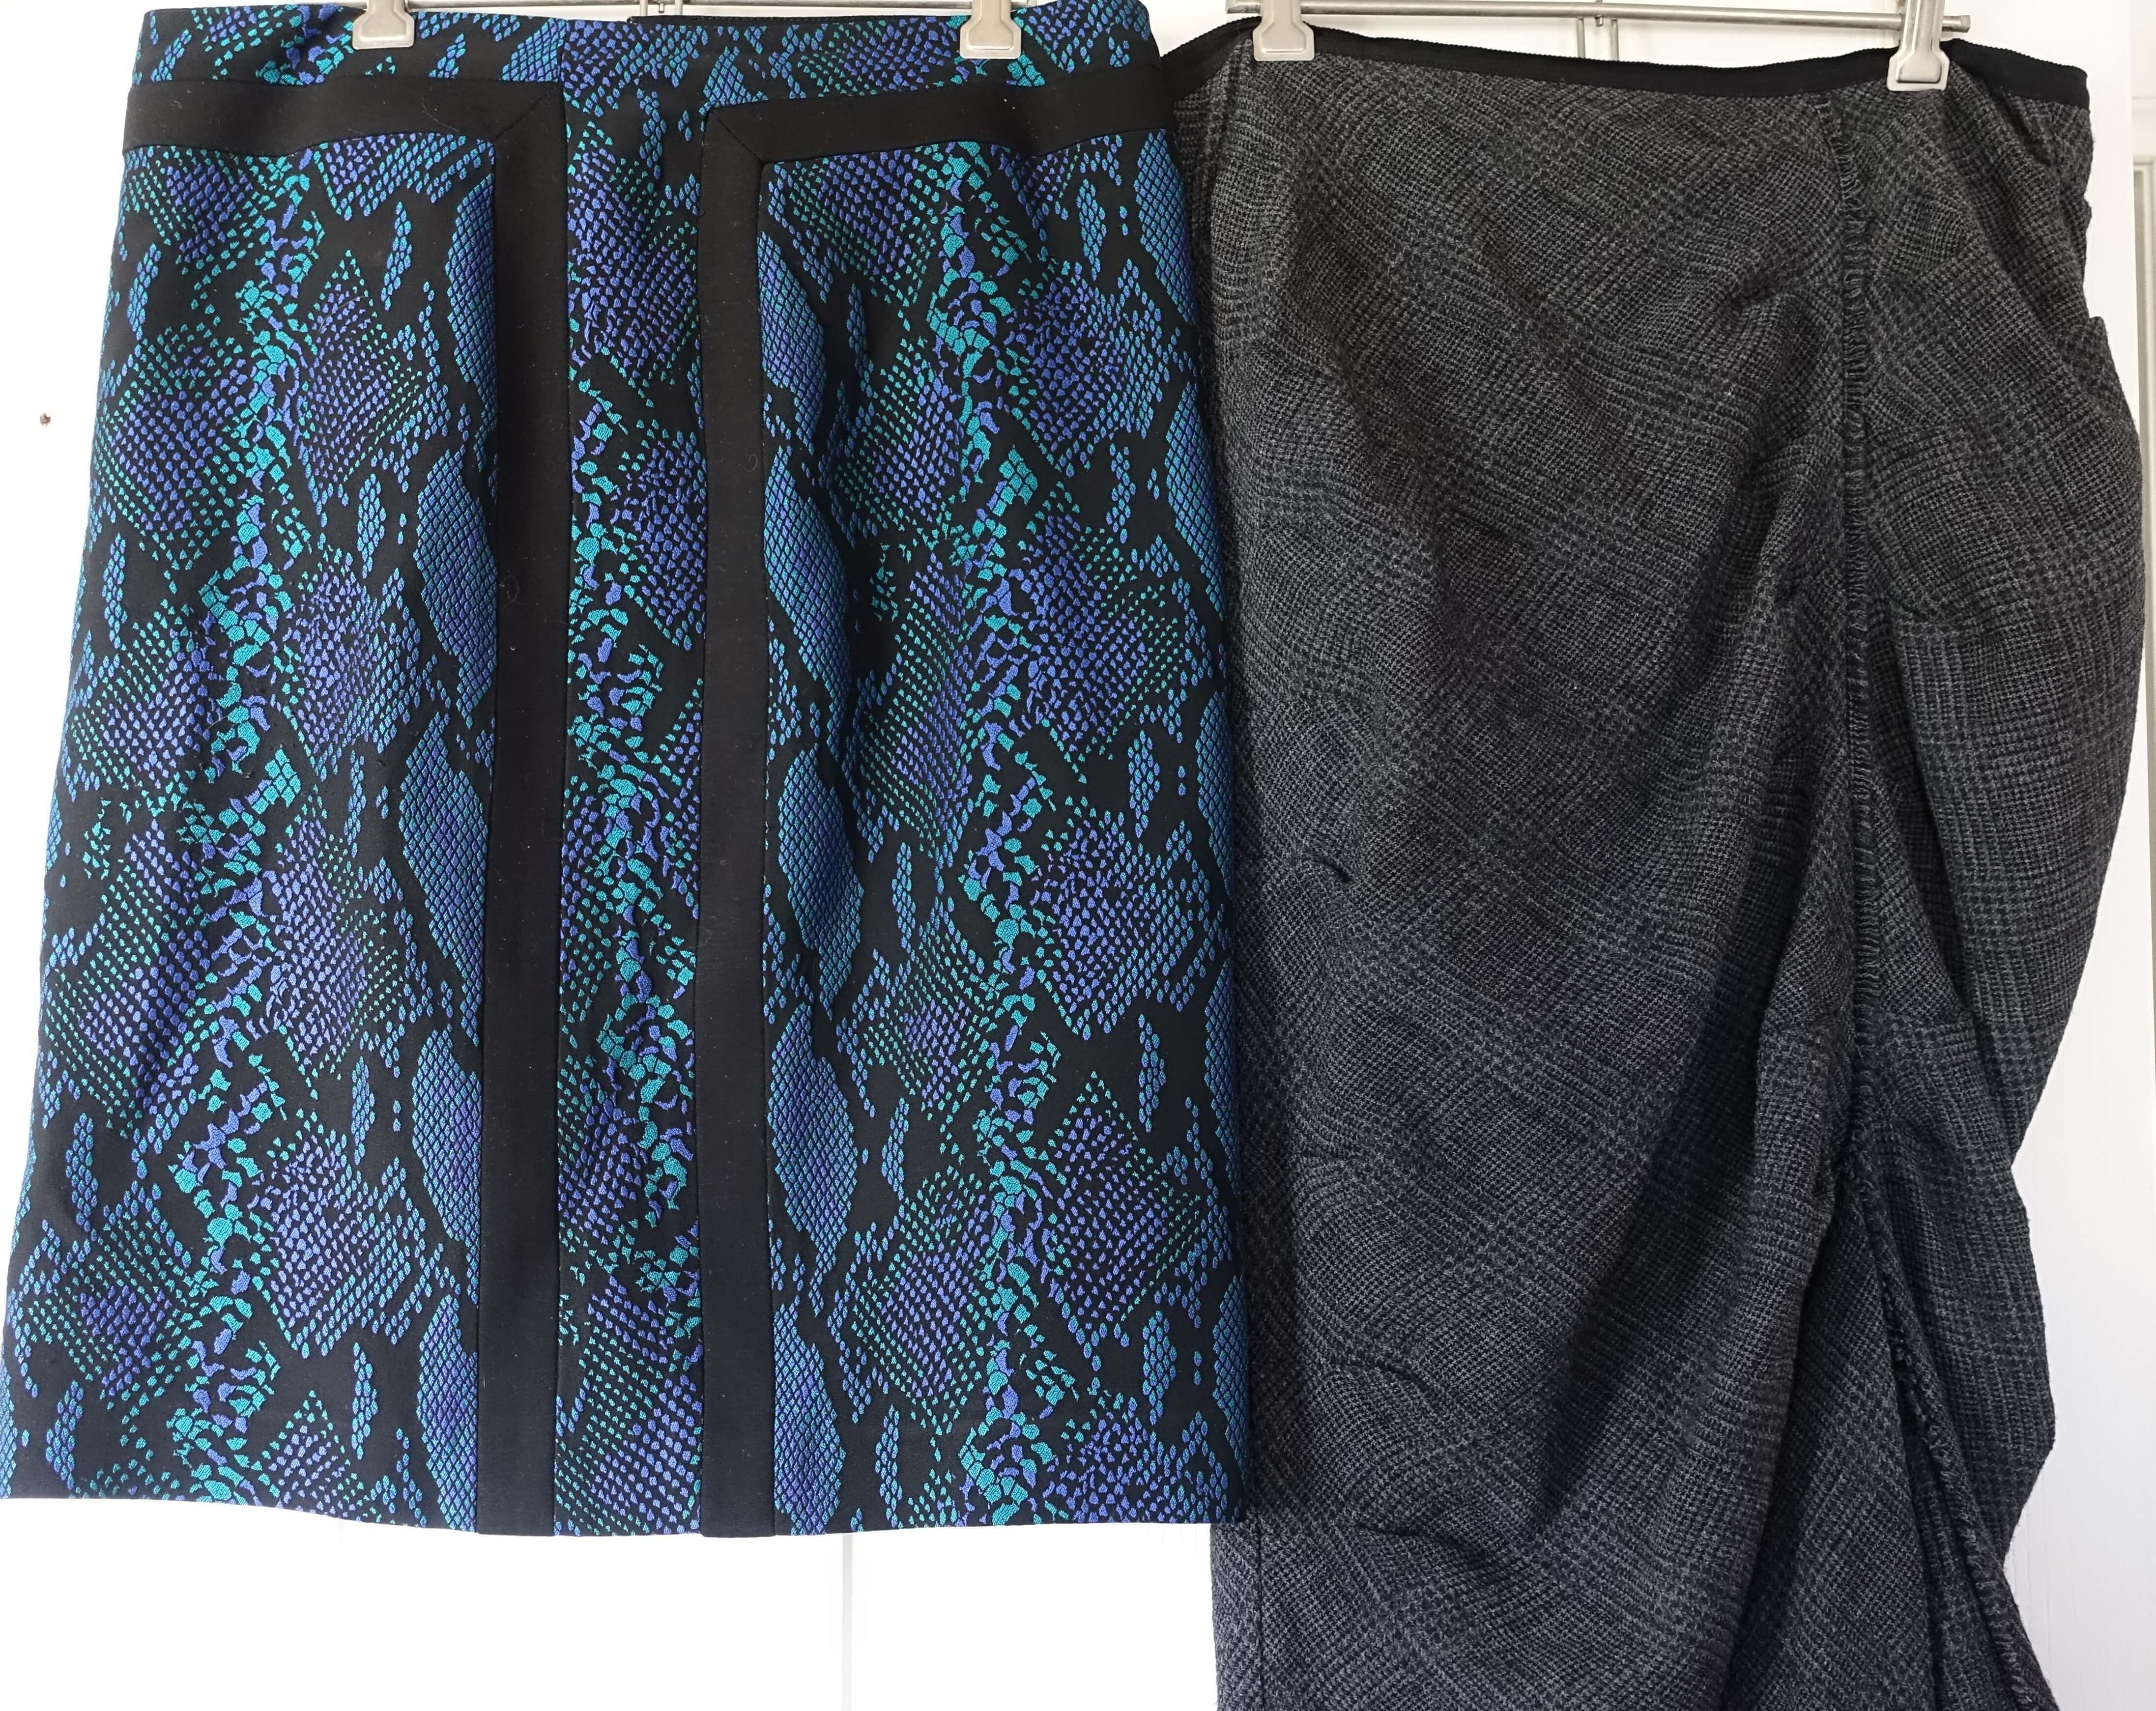 Grey Easton Pearson skirt and Dianne Von Furstenberg skirt